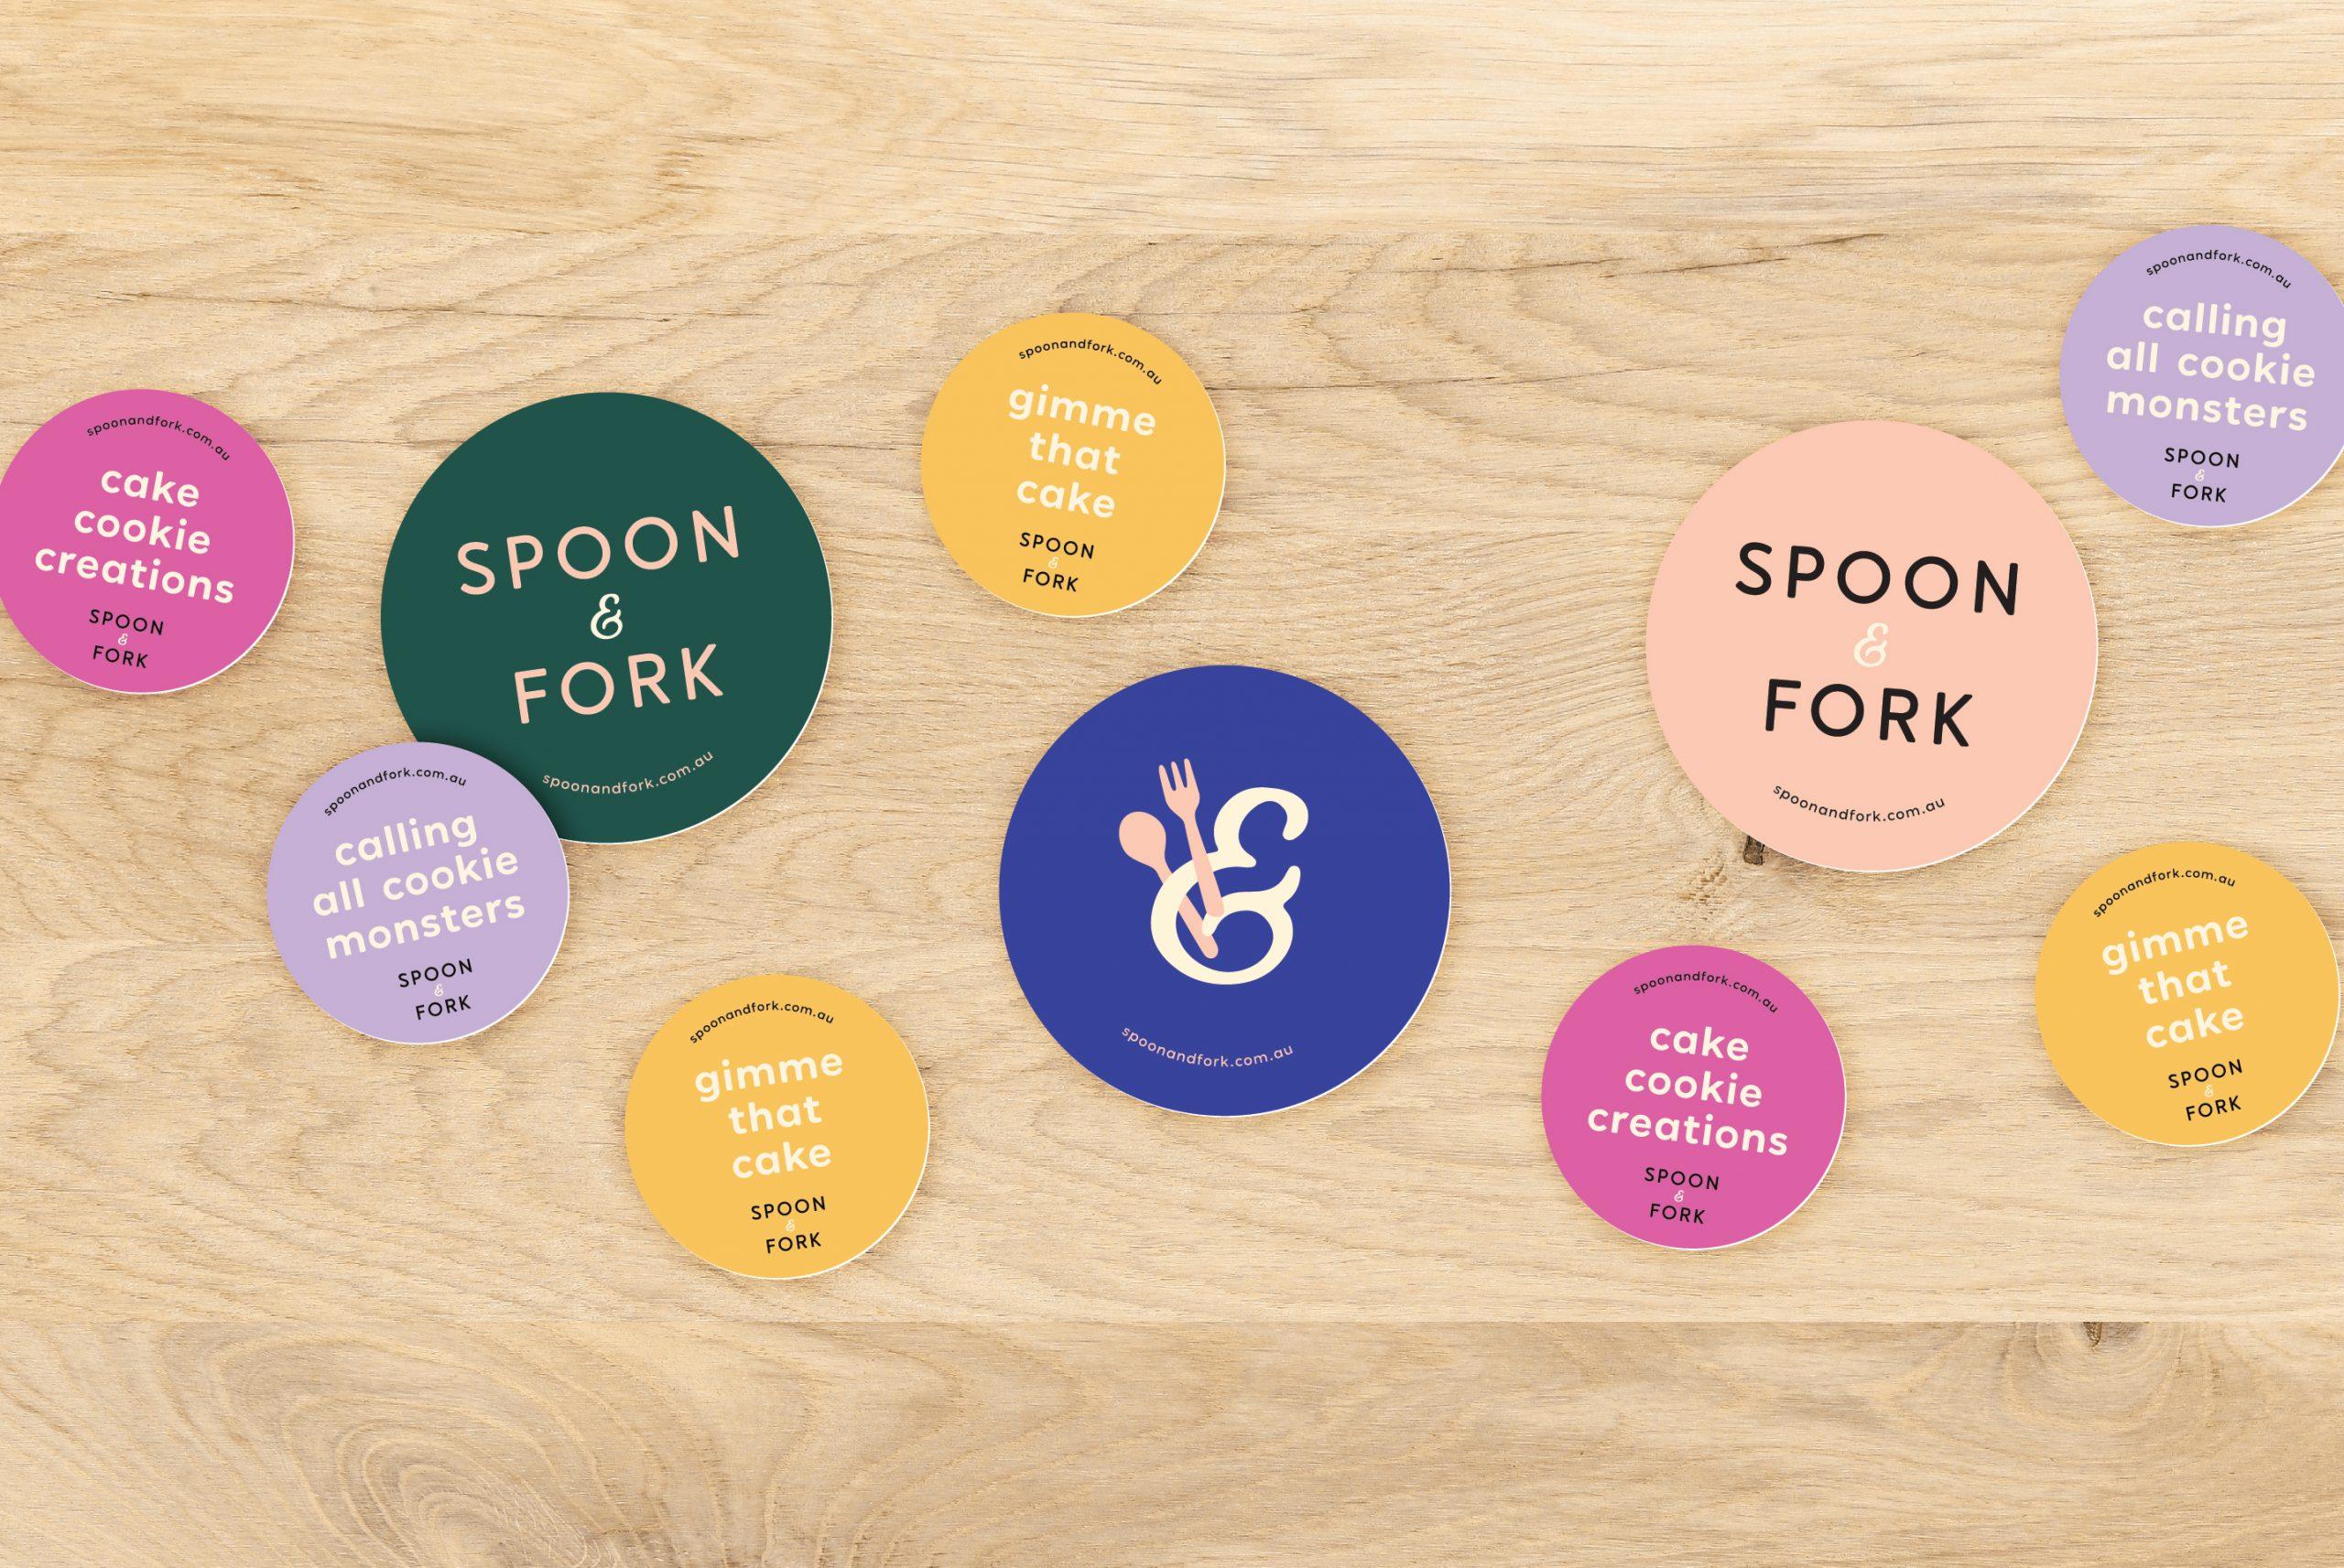 spoon-and-fork-brand-design-illustration-15